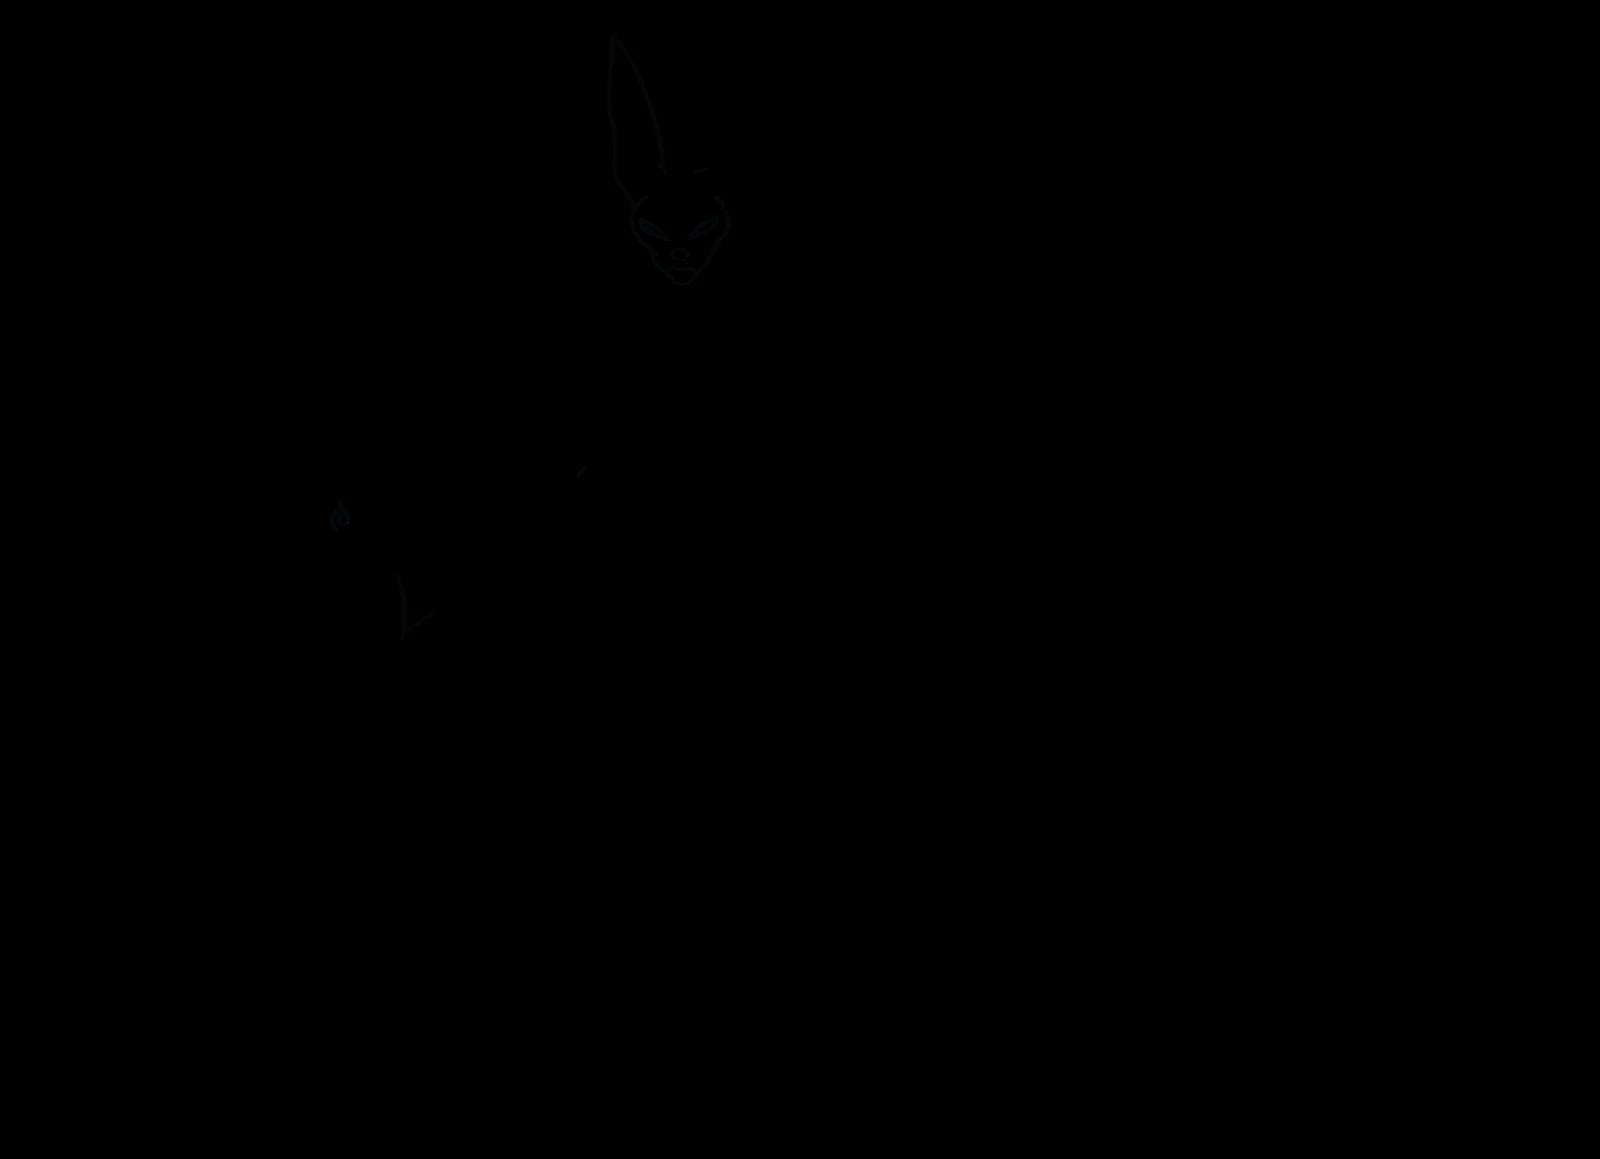 clip art download Vegeta and goku ssgss. Beerus drawing full body